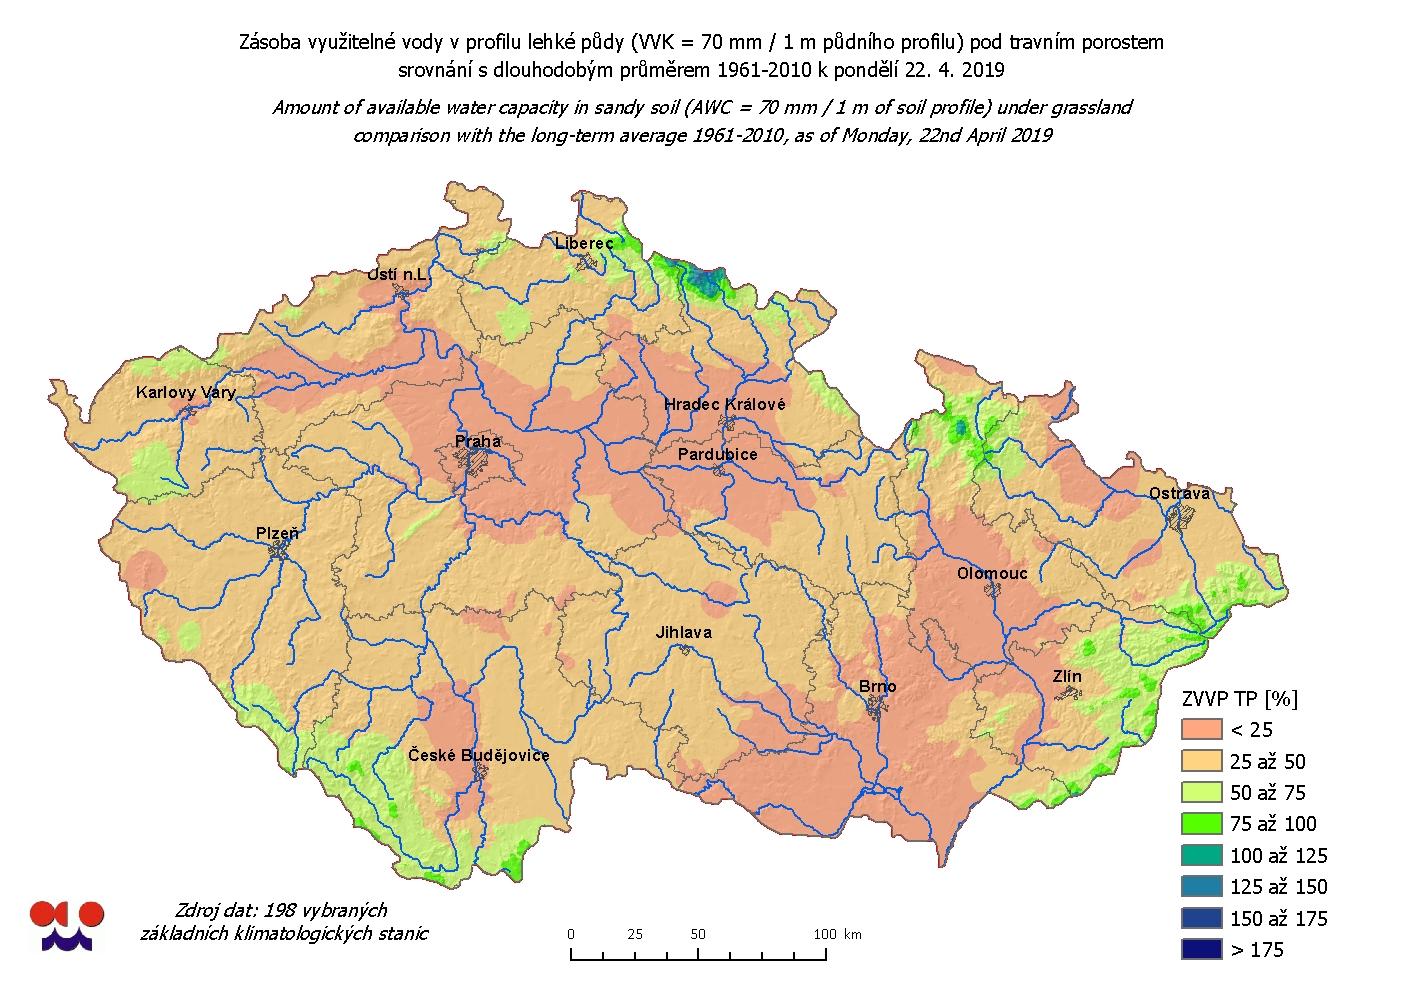 photo: CHMU;desc: Zasoba vyuzitelne vody v profilu lehke pudy 2019;link: http://portal.chmi.cz/files/portal/docs/meteo/ok/SUCHO/zvvp_lp_srov.html;